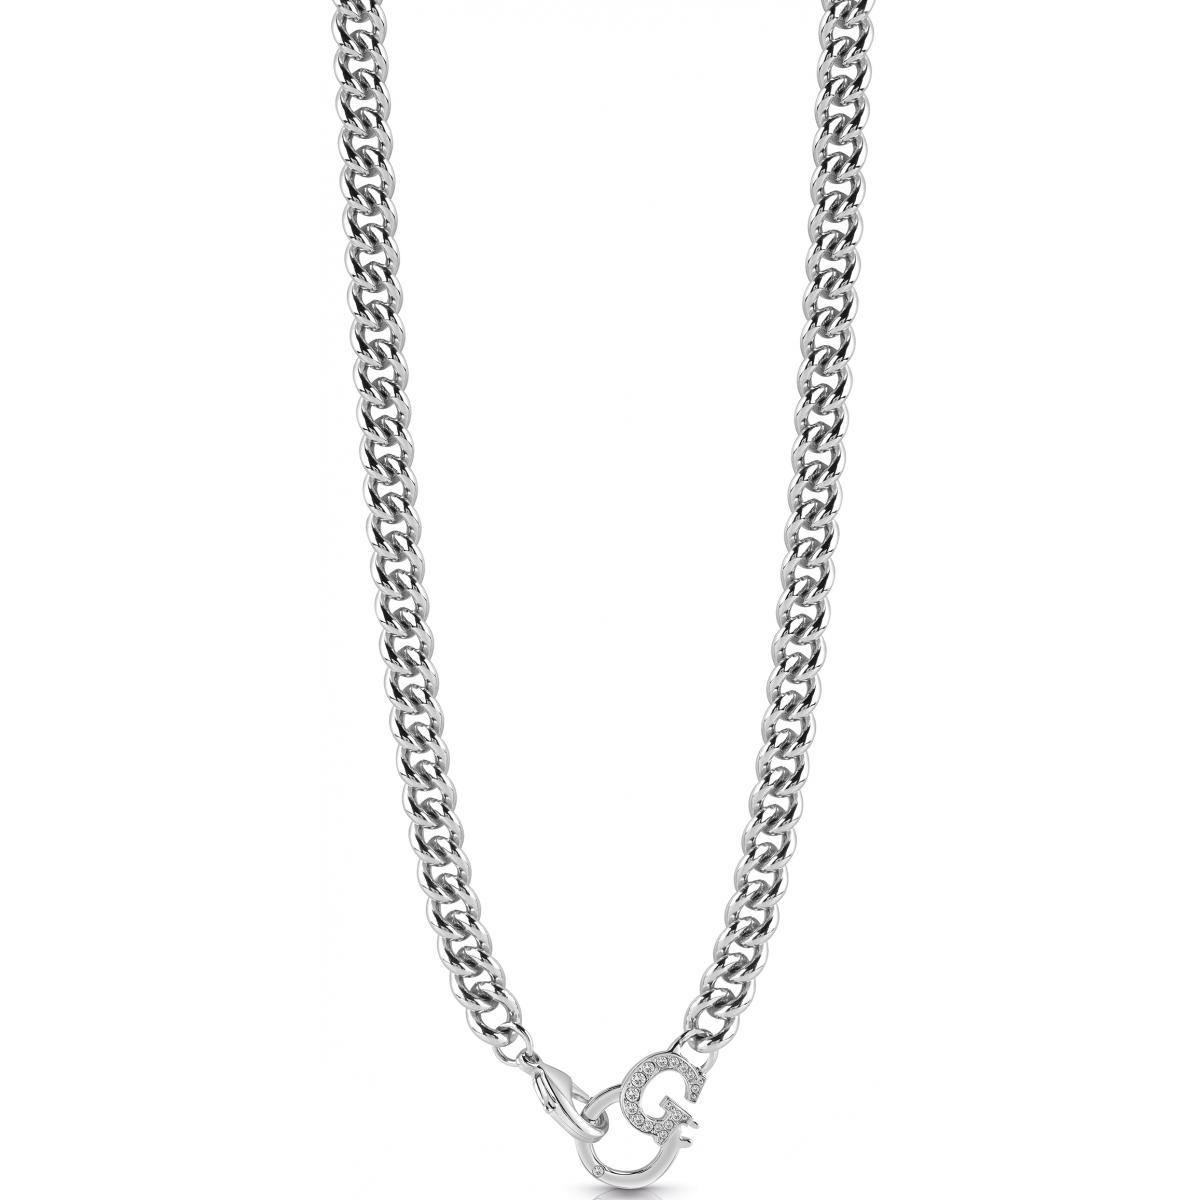 collier grosse chaine